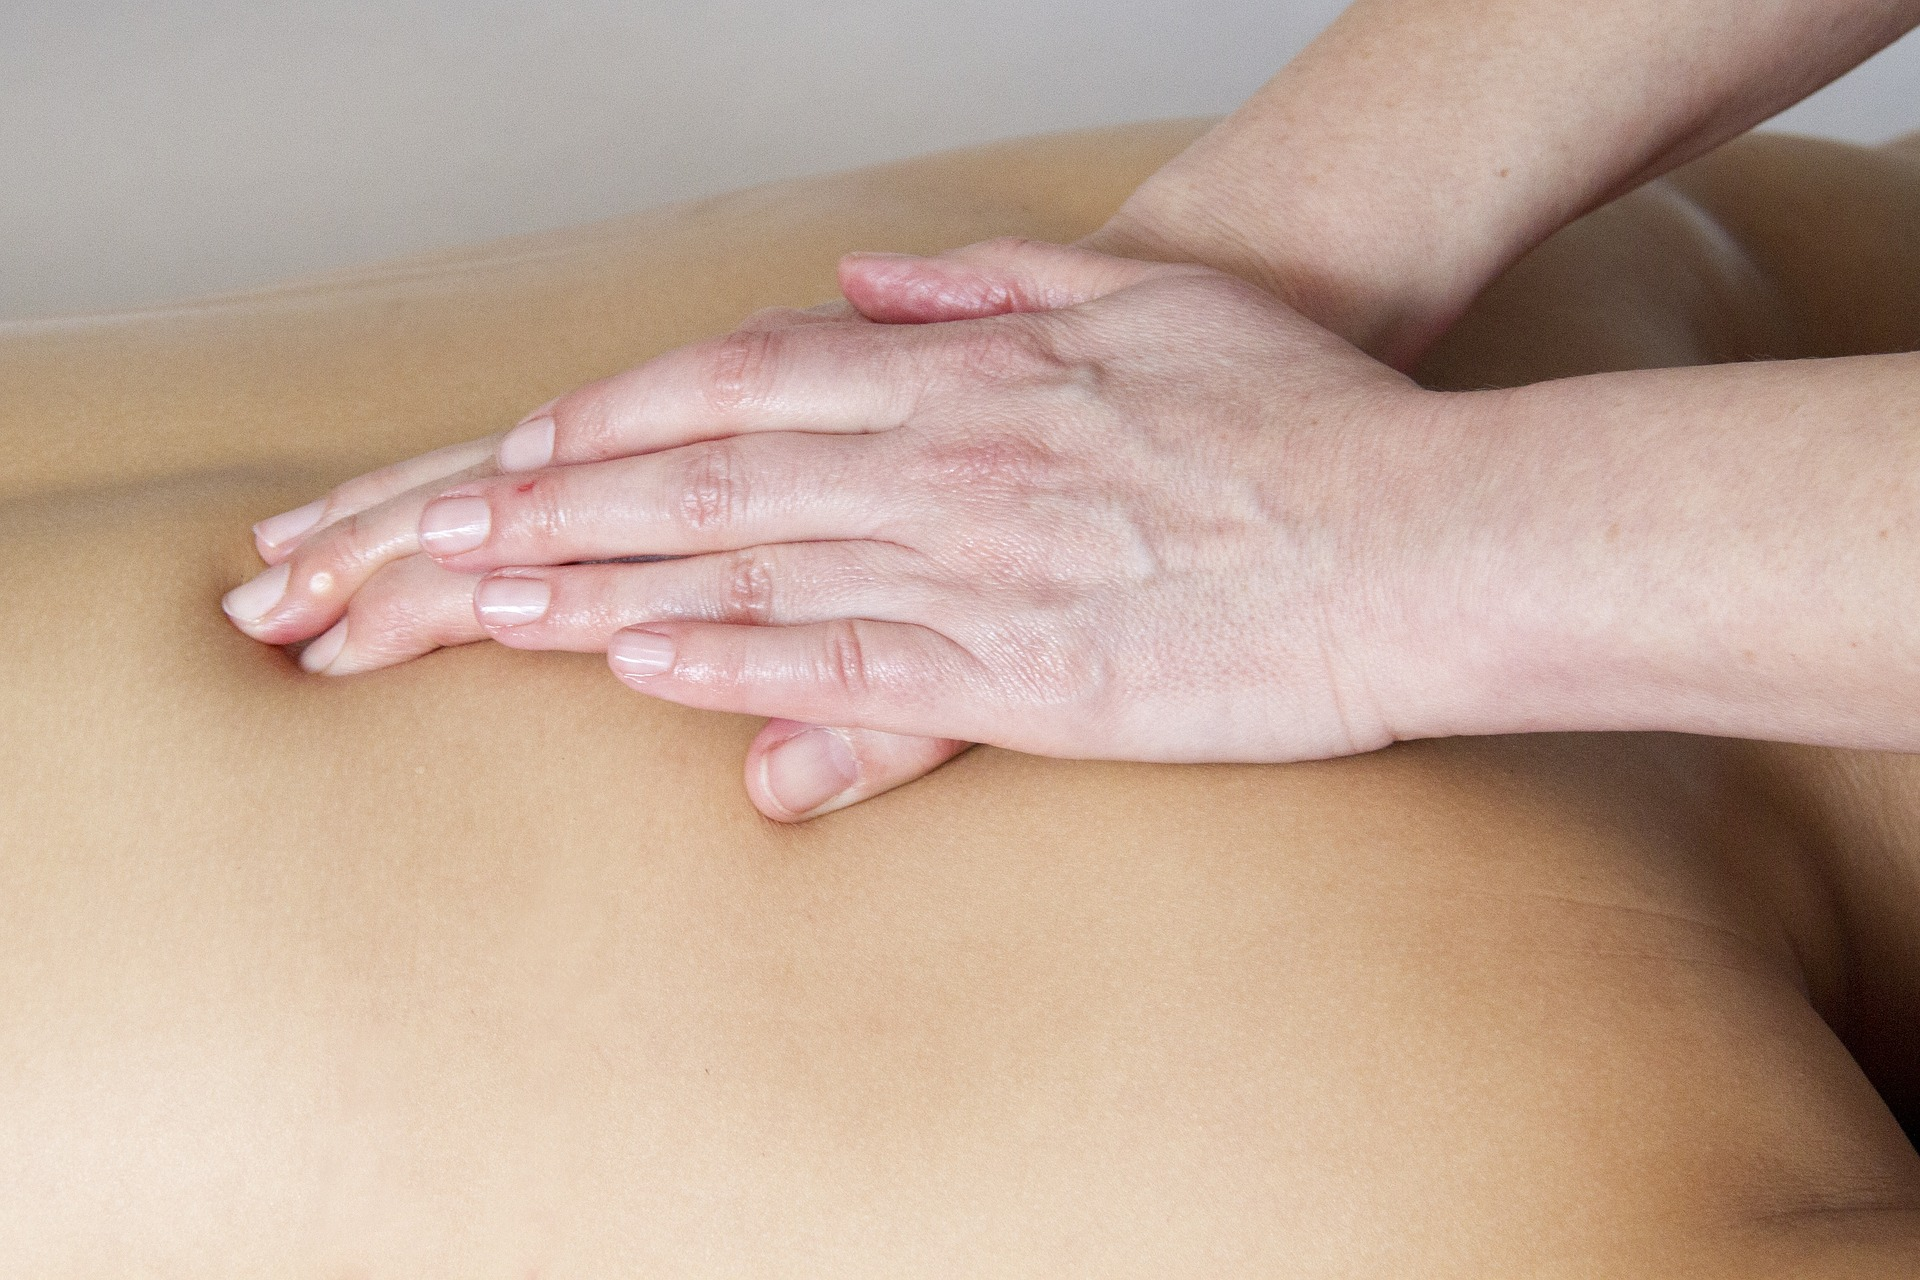 ar galima atlikti 2 laipsniu hipertenzijos masaza